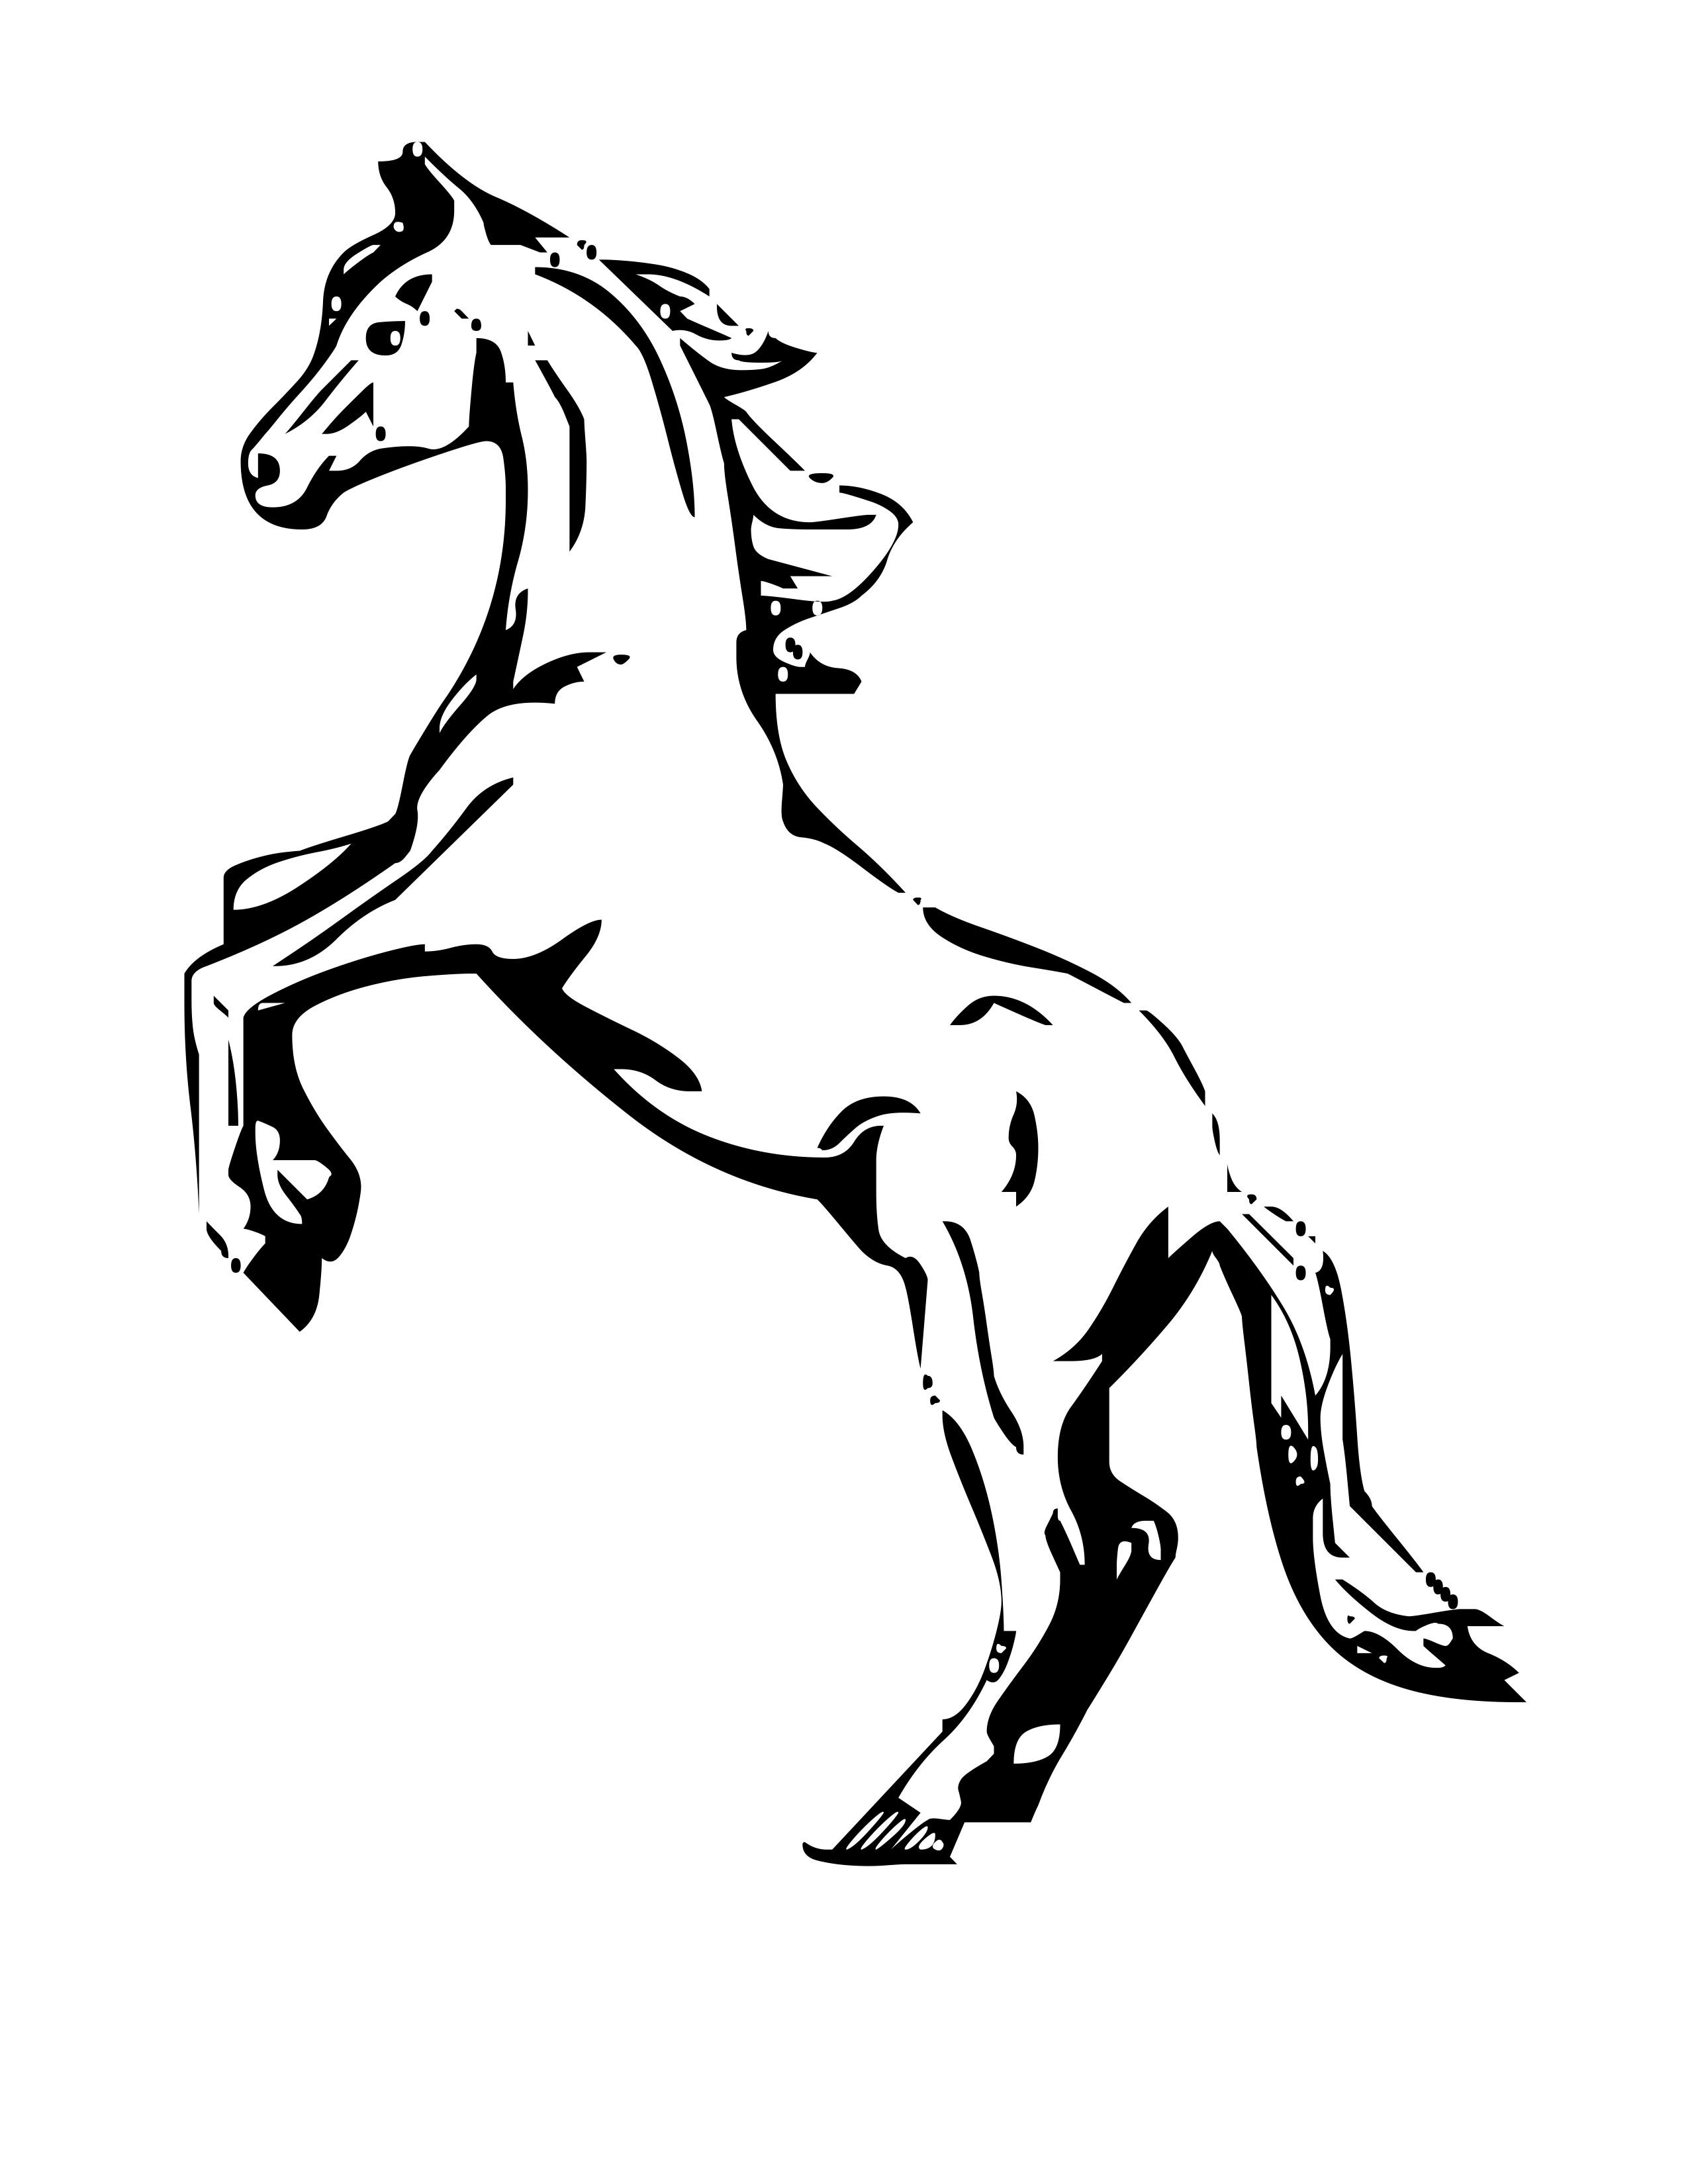 Mustang Outline Drawing At GetDrawings